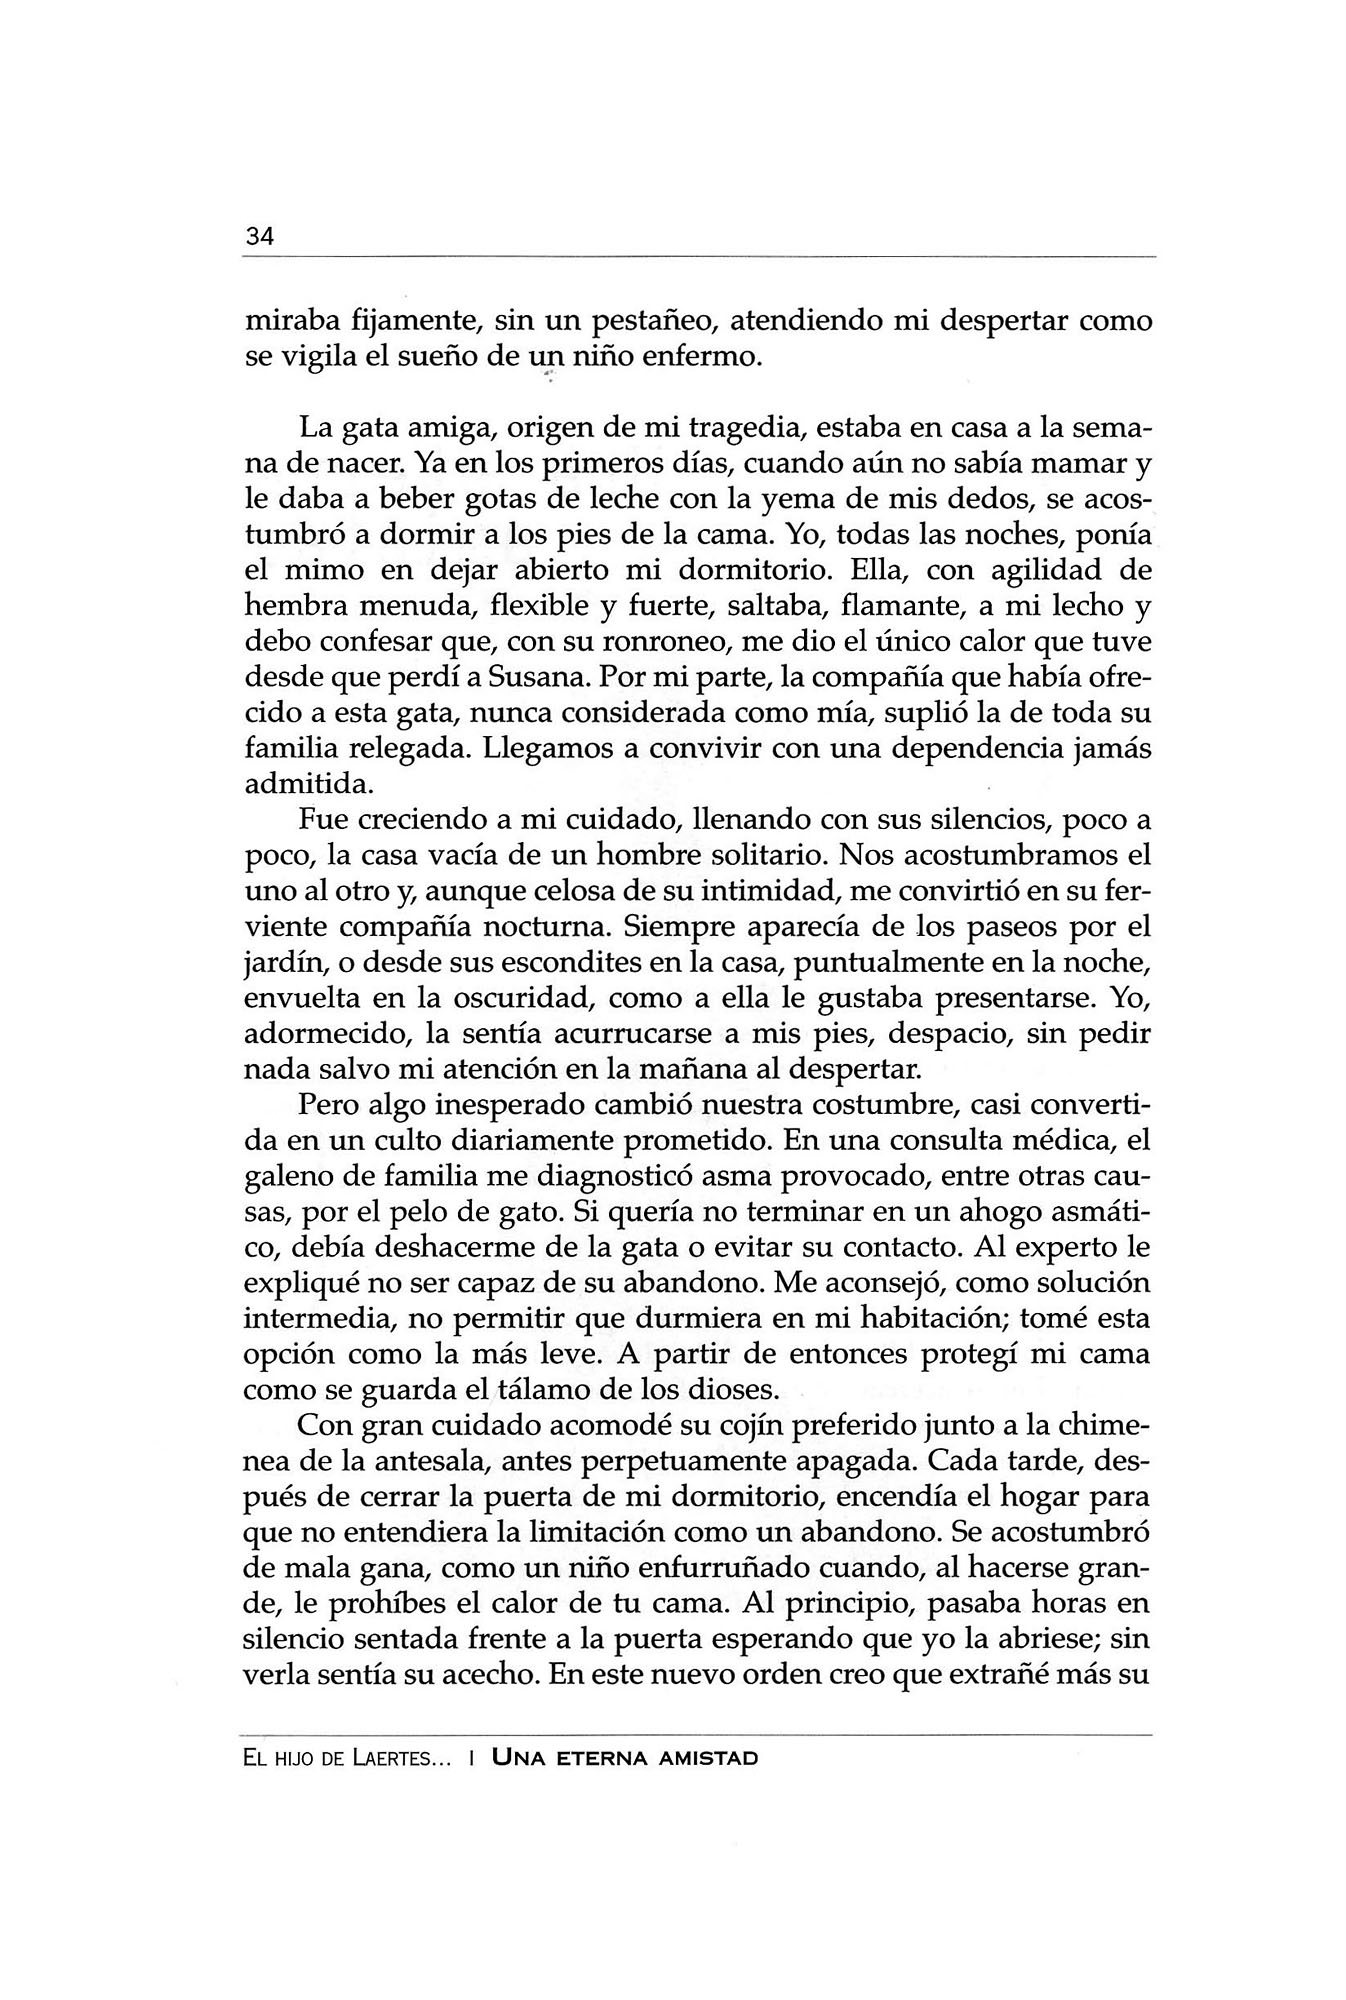 danielvillalobos-calderonsamaniego-shortstory-spanishliterature-5